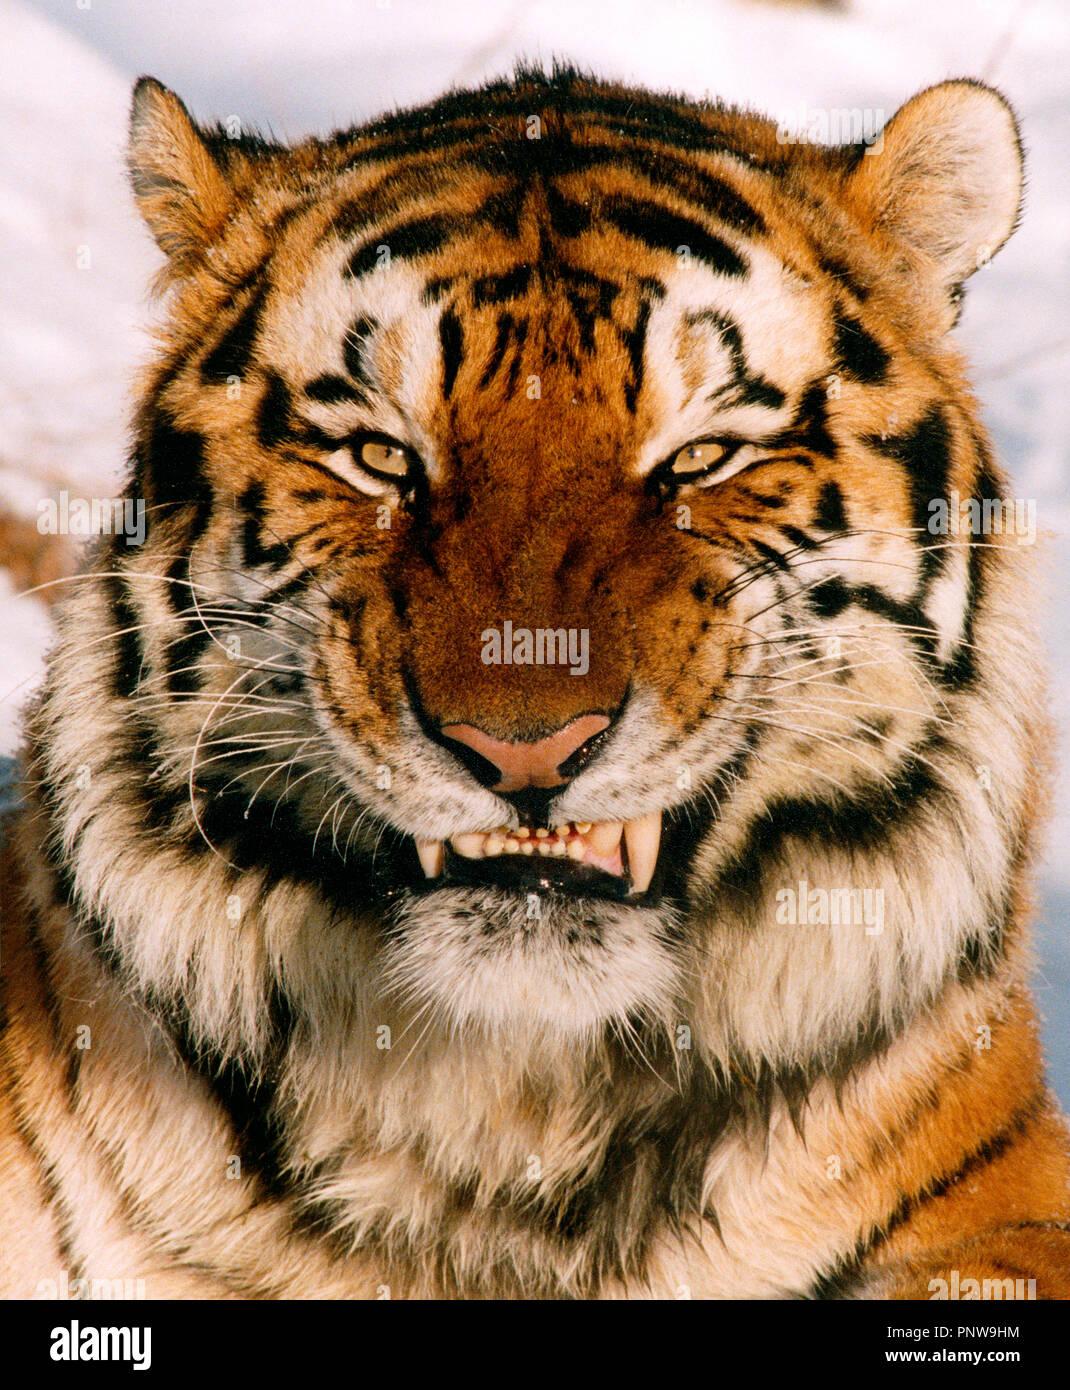 Piscine close up portrait of Siberian Tiger grognement féroce. La Russie. Photo Stock